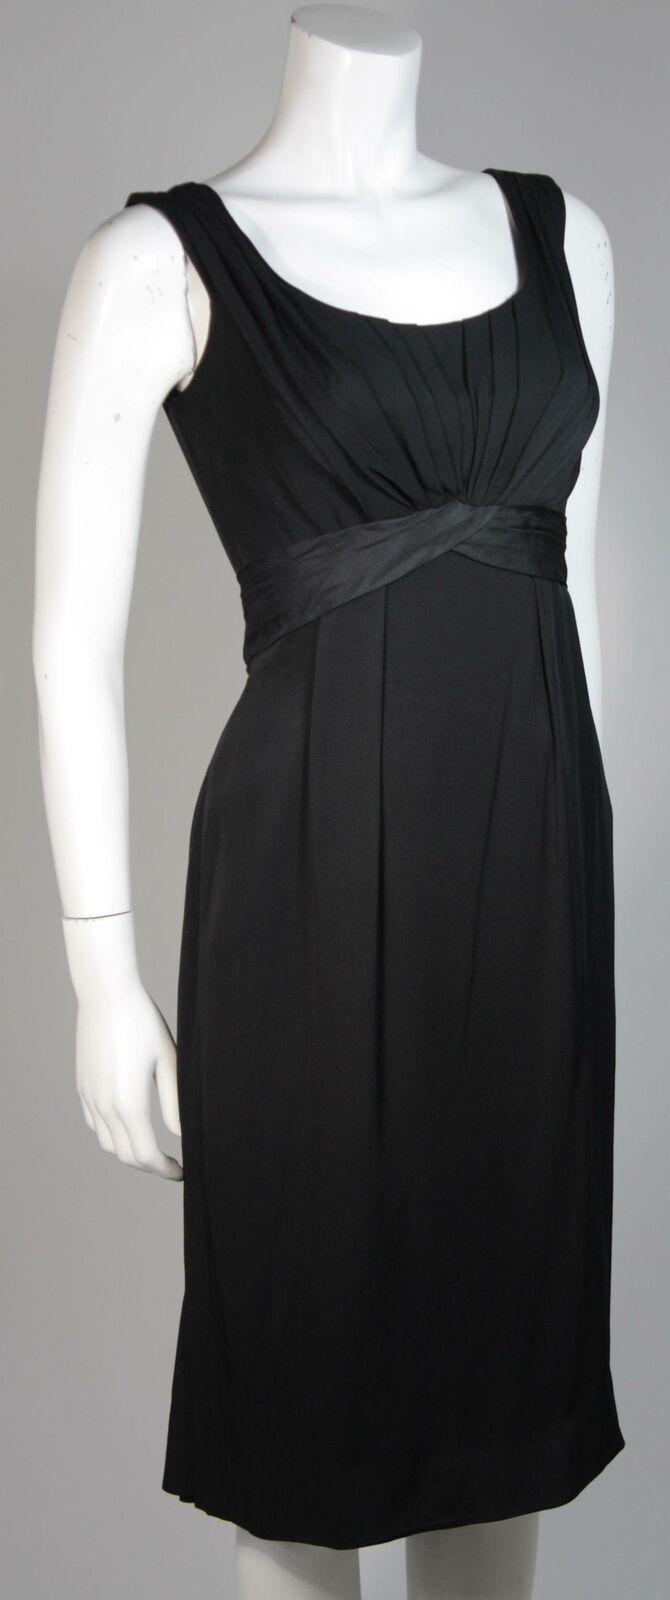 CEIL CHAPMAN 1950s Black Draped Cocktail Dress Si… - image 4